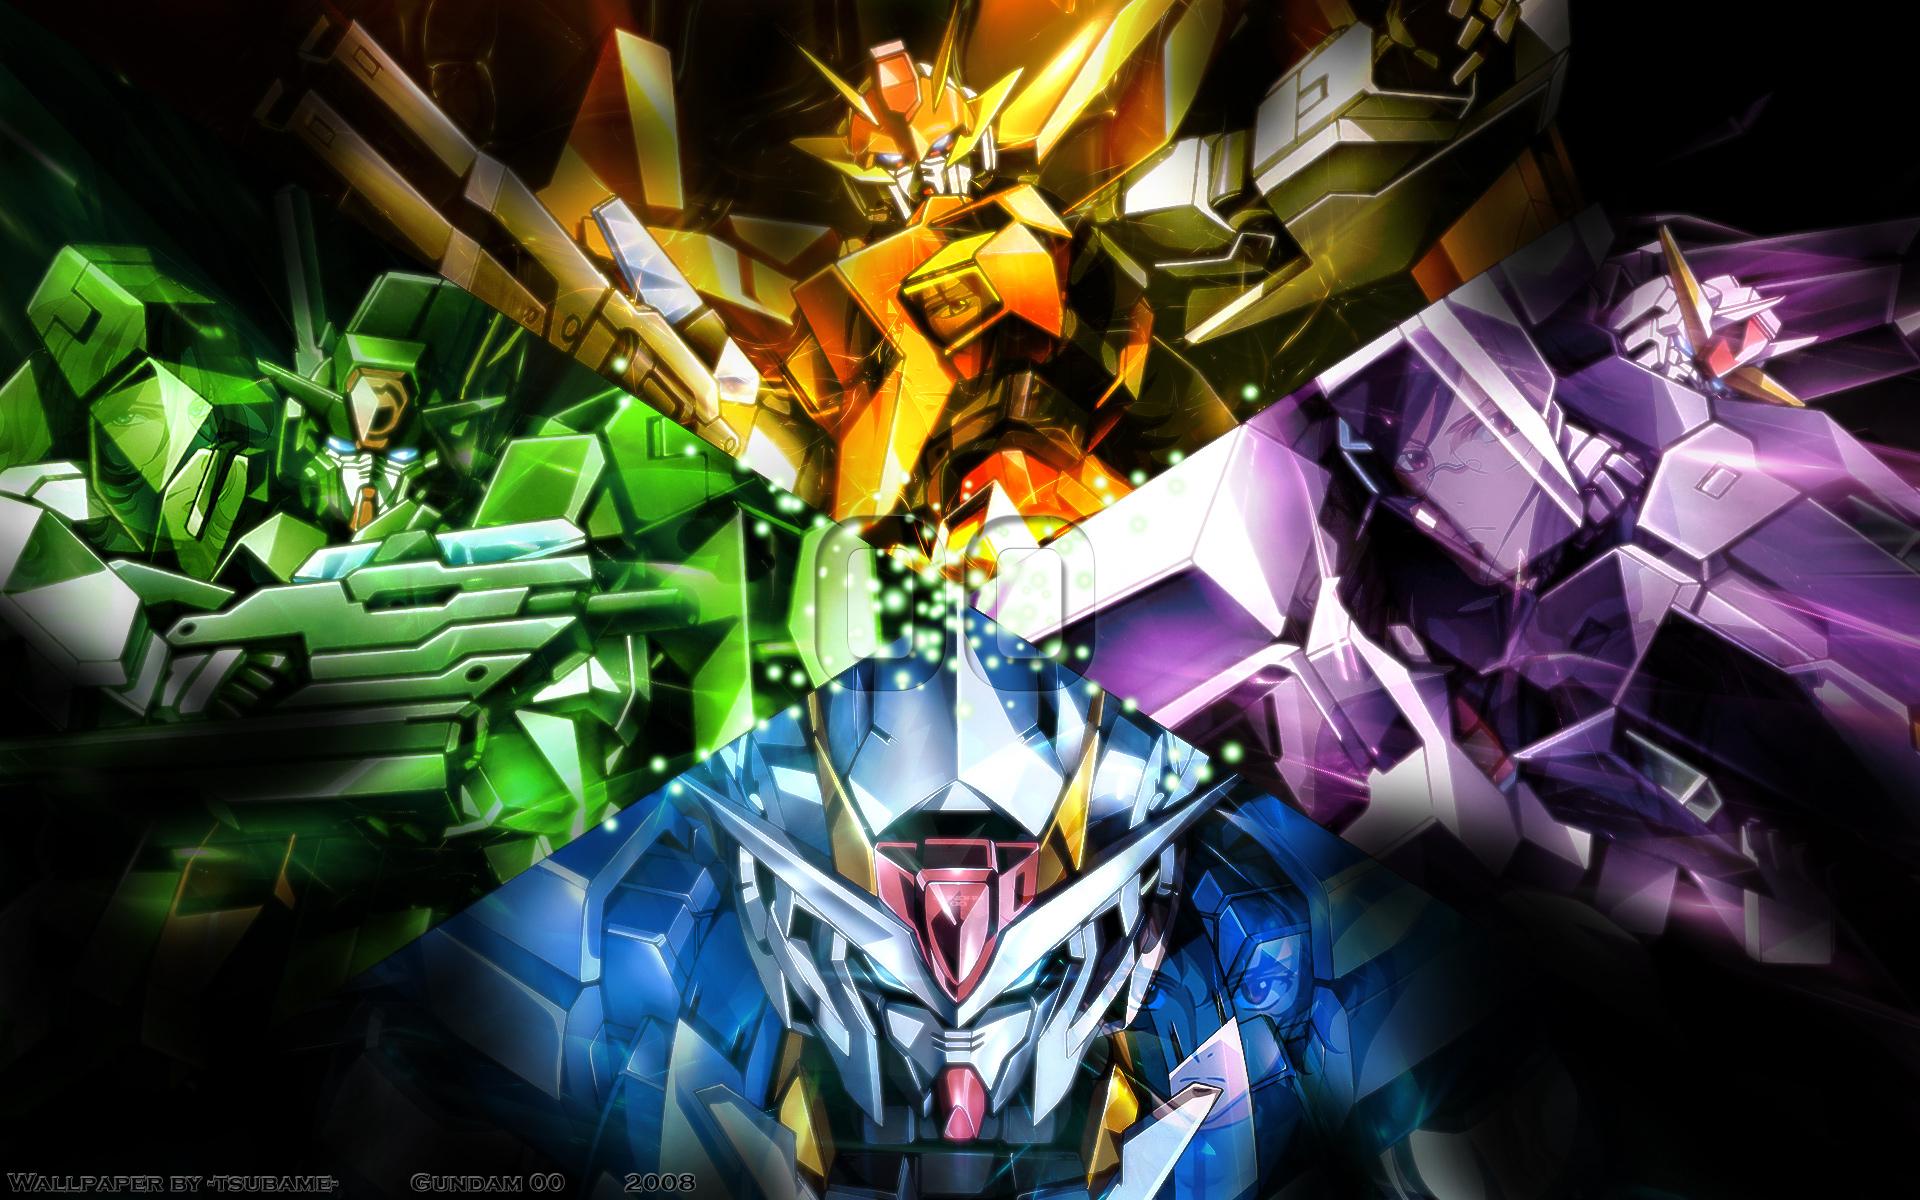 Pics Photos   Mobile Suit Gundam 00 Wallpaper Gundam 00 1920x1200